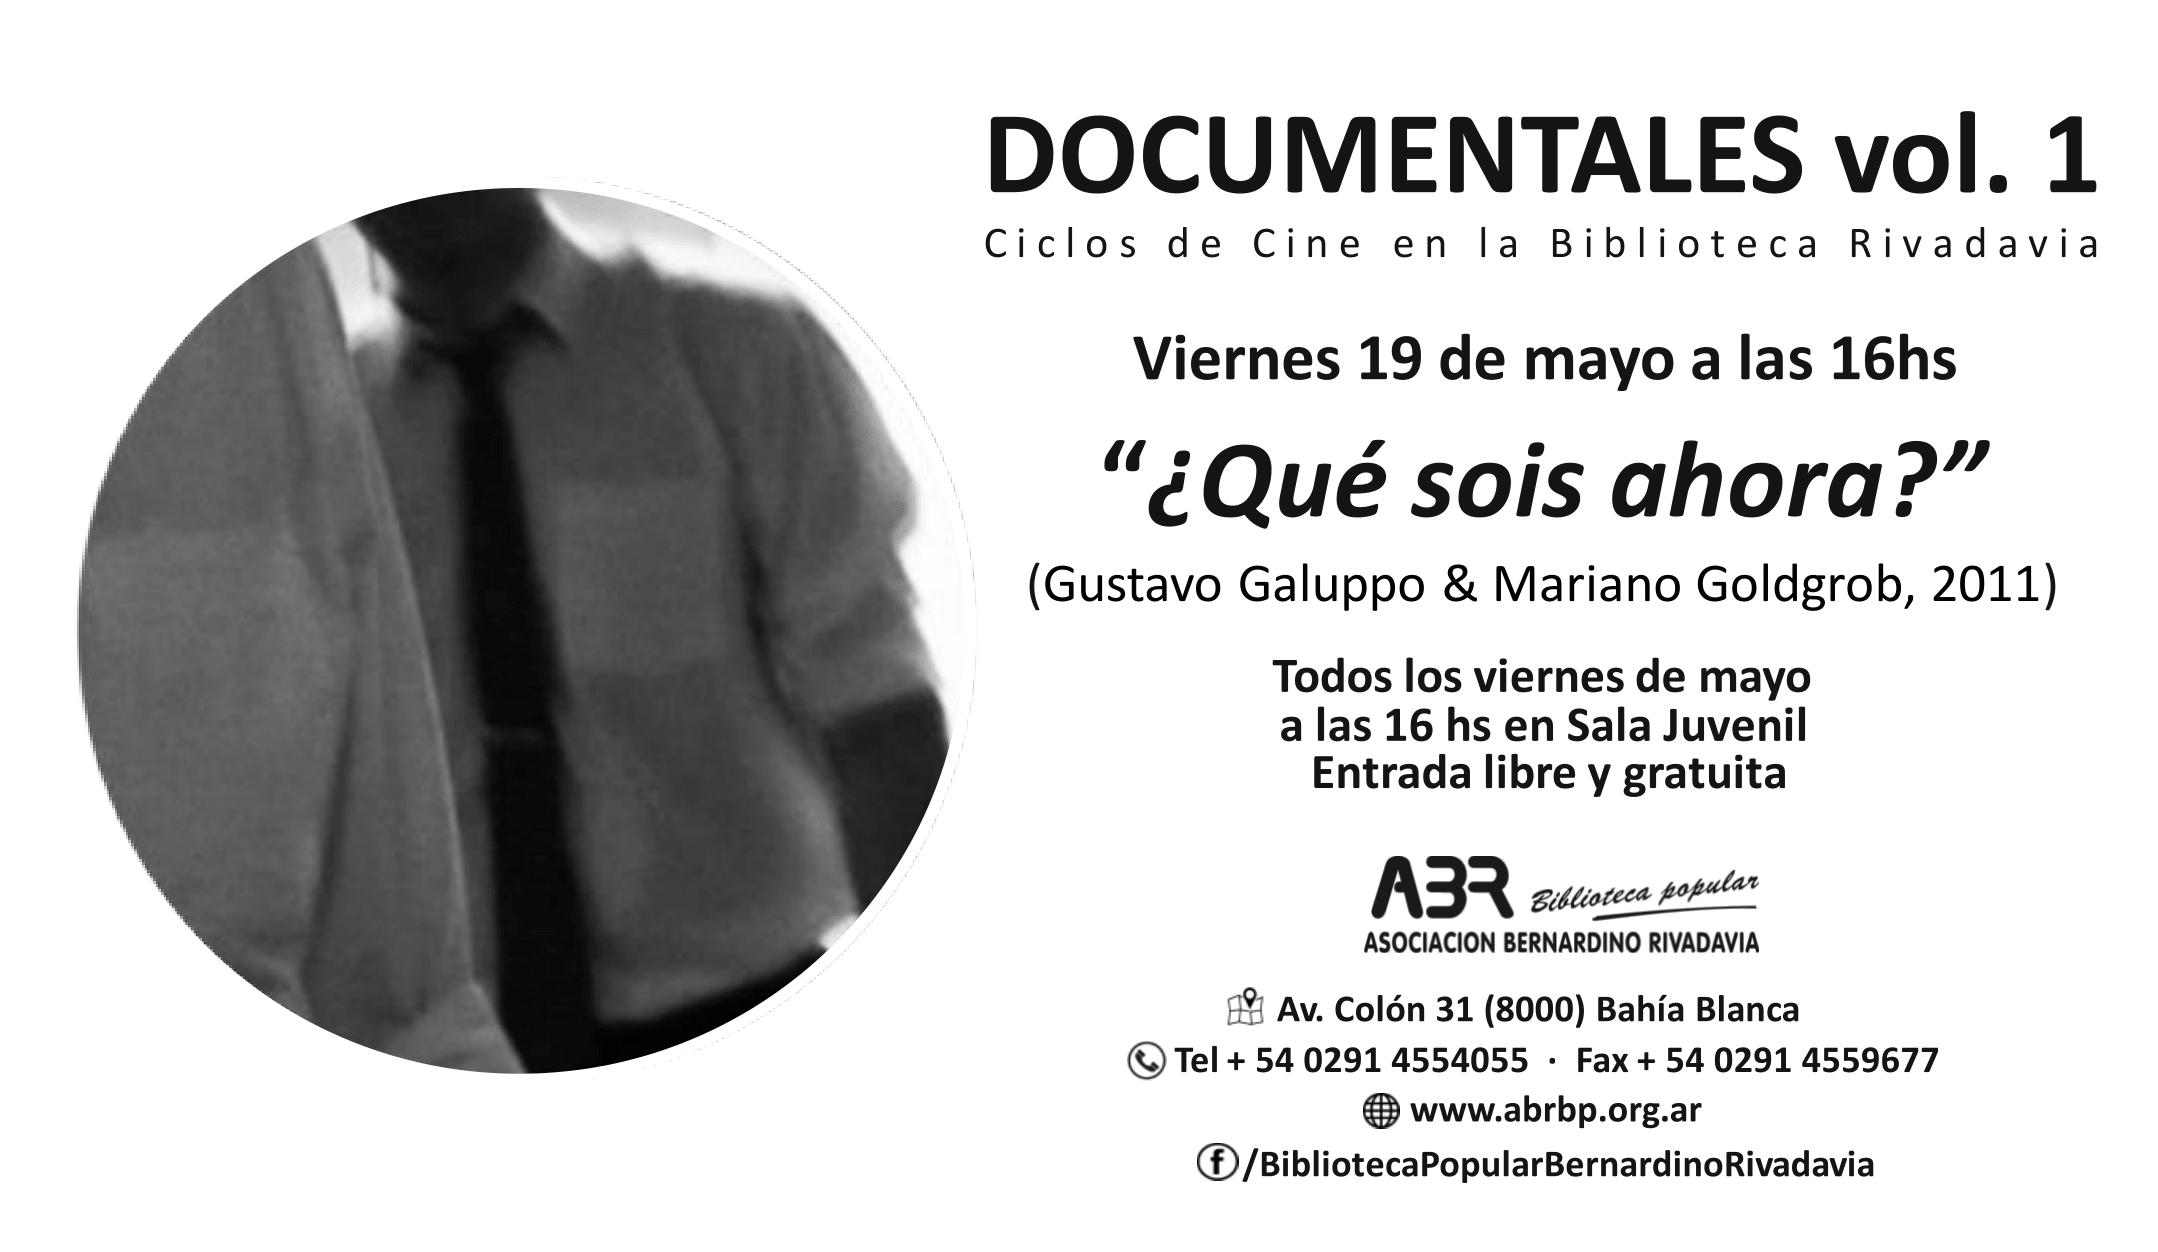 Gustavo Galuppo & Mariano Goldgrob - Qué sois ahora